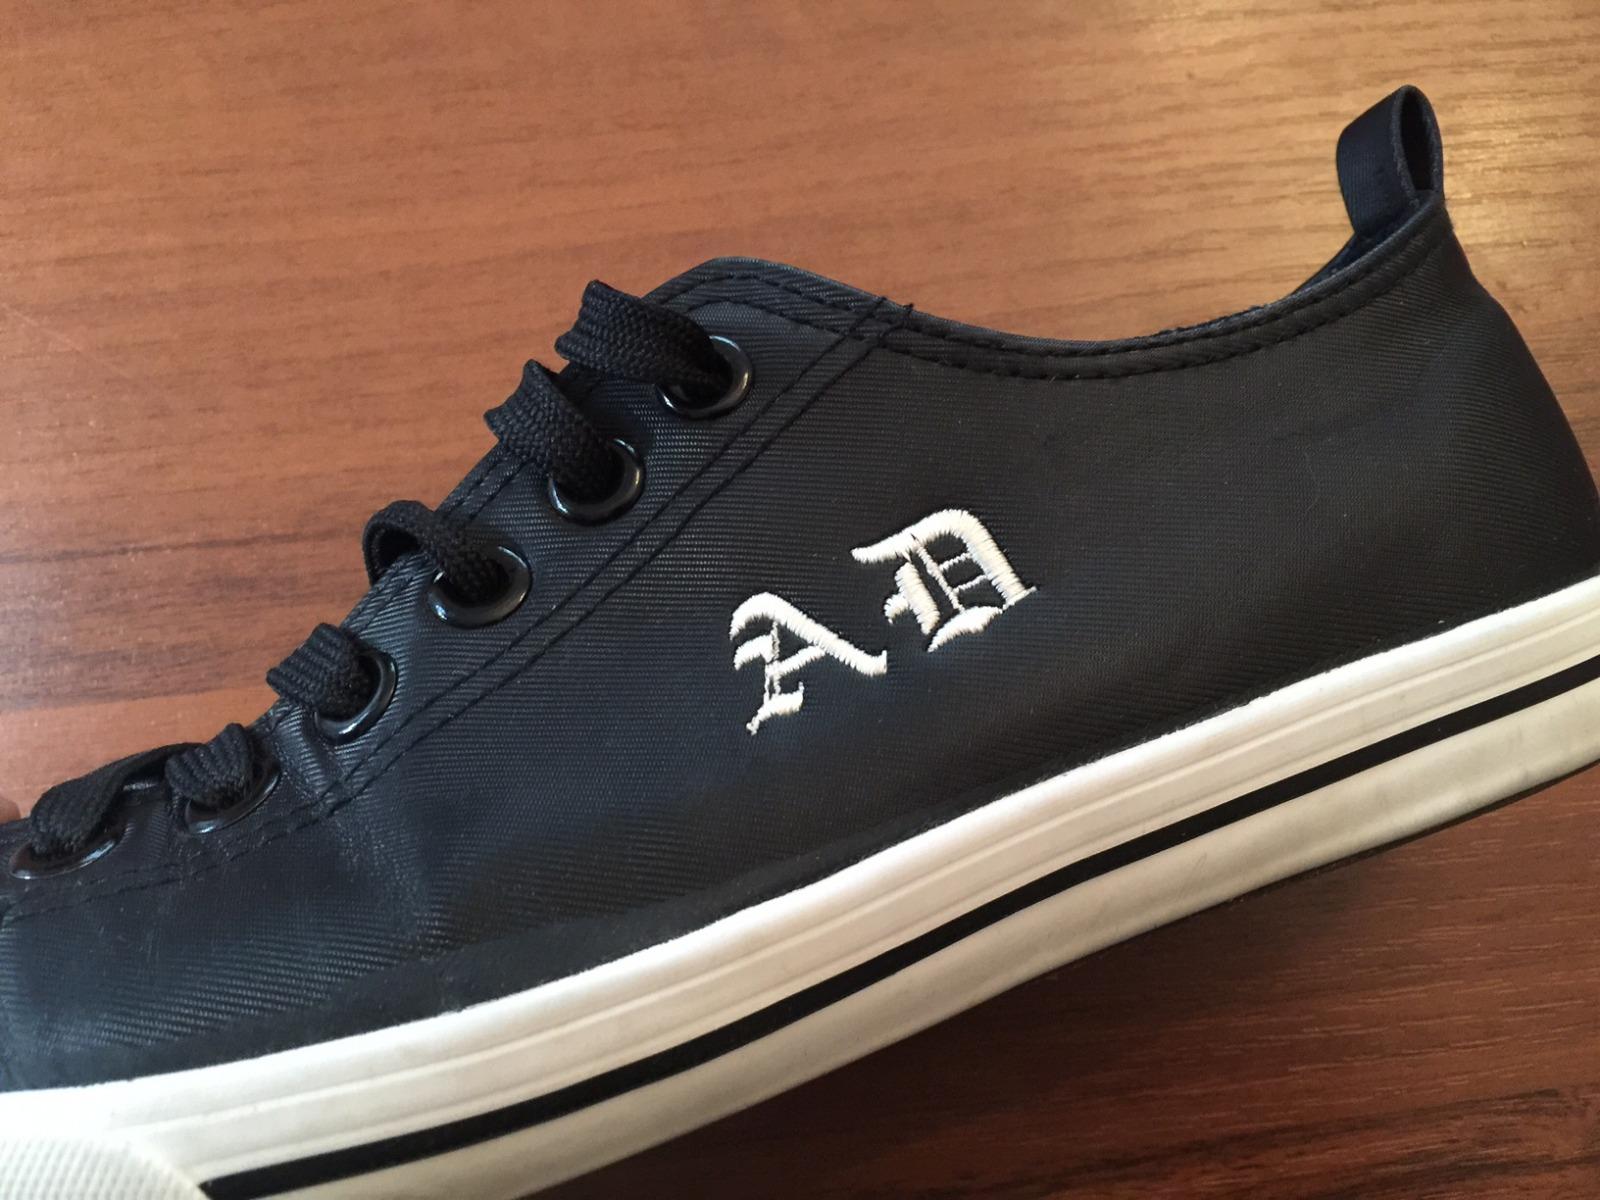 check out eb844 33430 Schuhstickerei | Schuhe personalisieren | Schuhe besticken ...